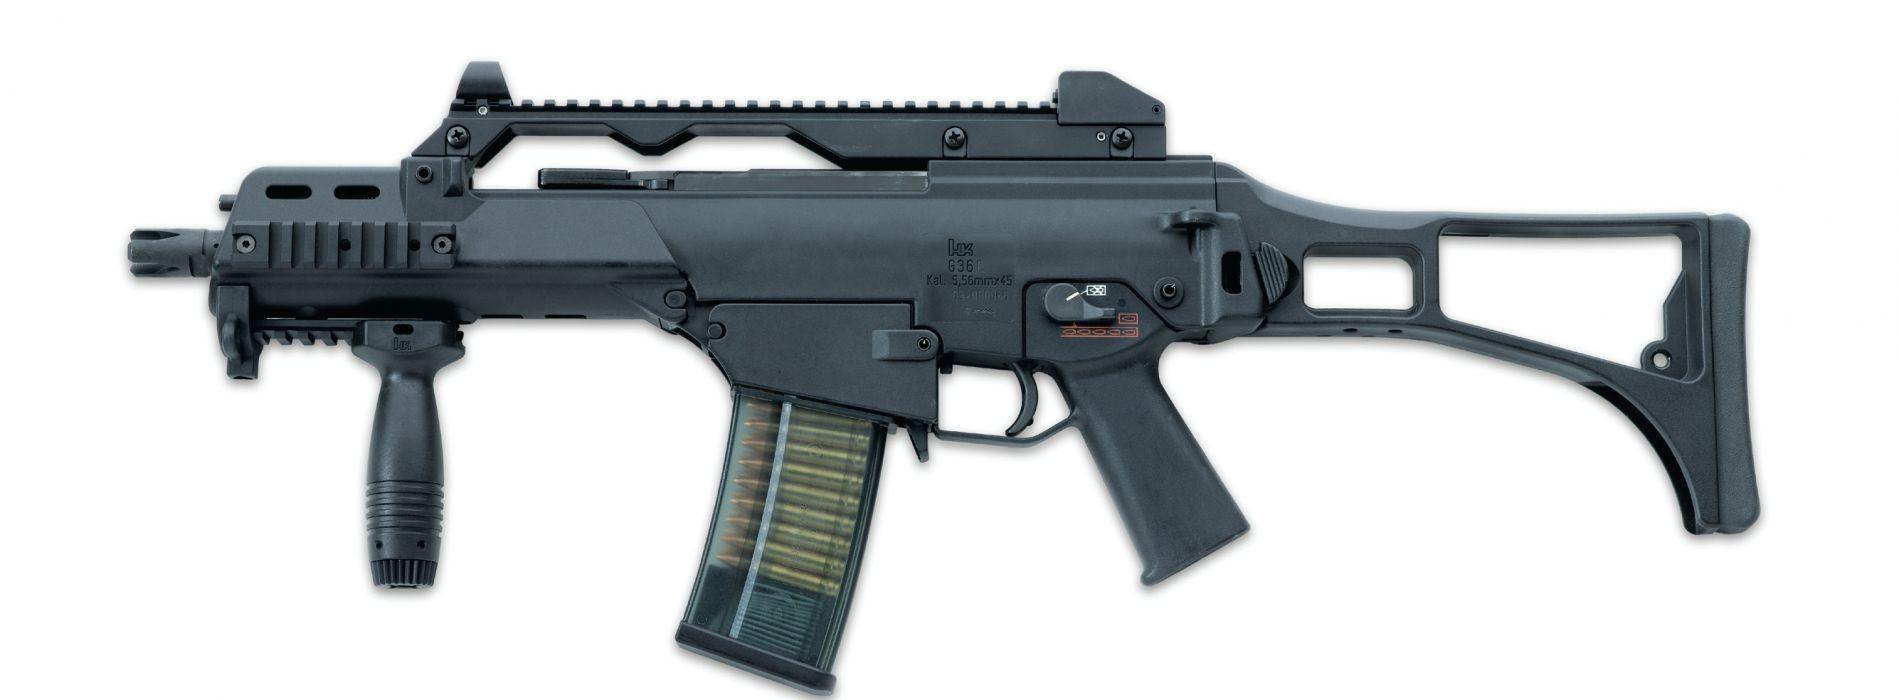 Heckler & Koch G36 weapon gun military rifle     g wallpaper